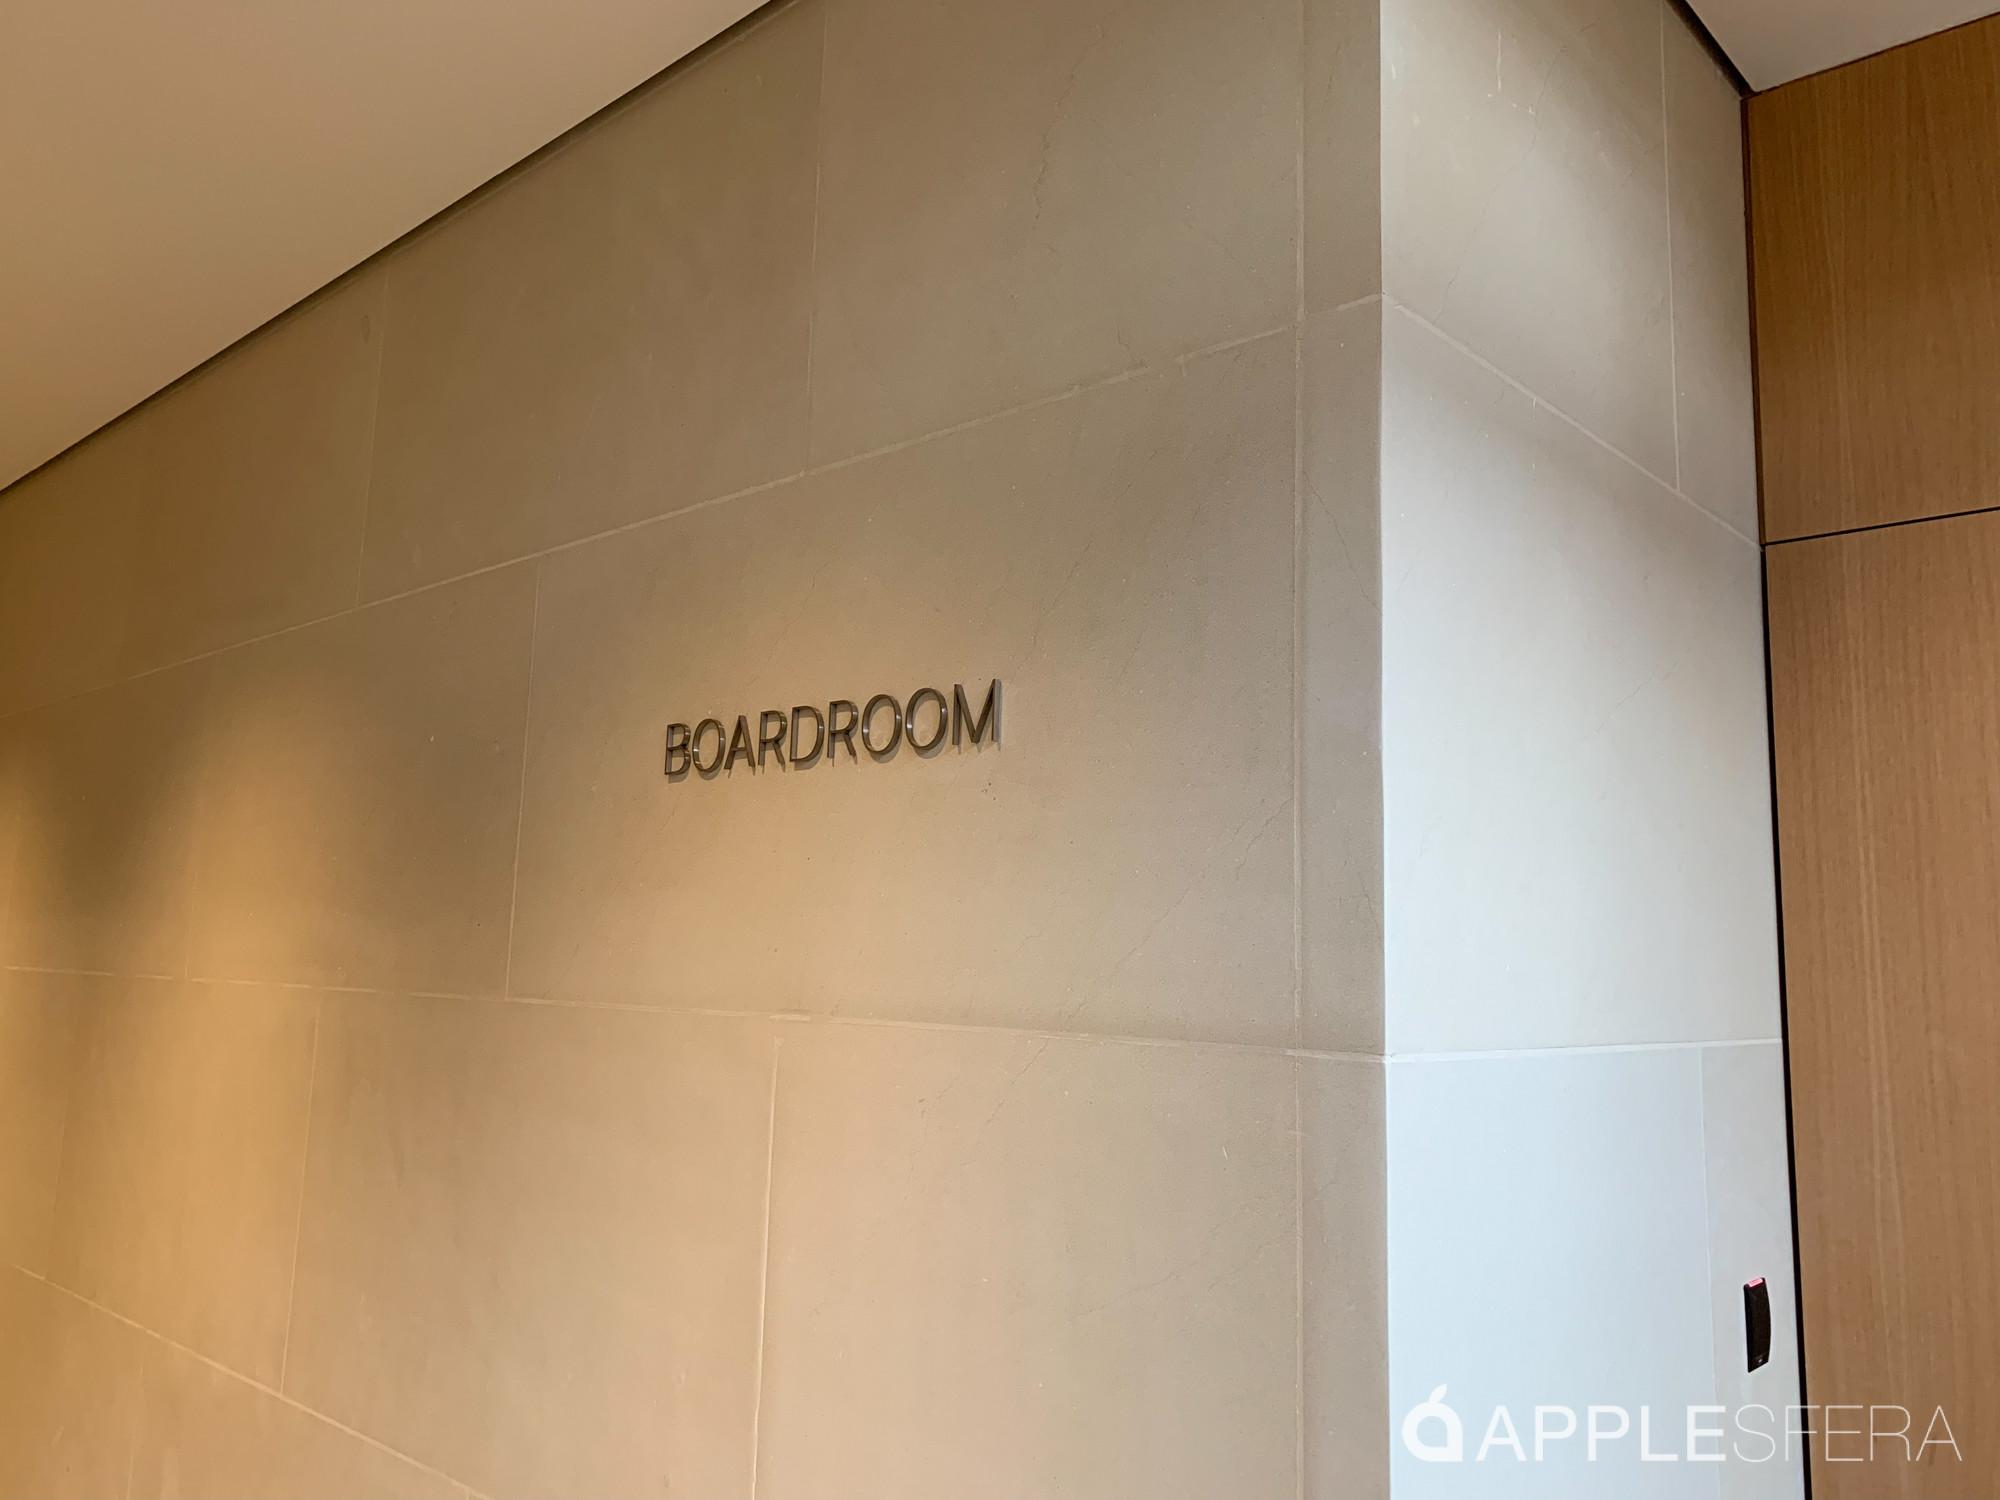 Foto de Apple Store Passeig de Gràcia (7/28)